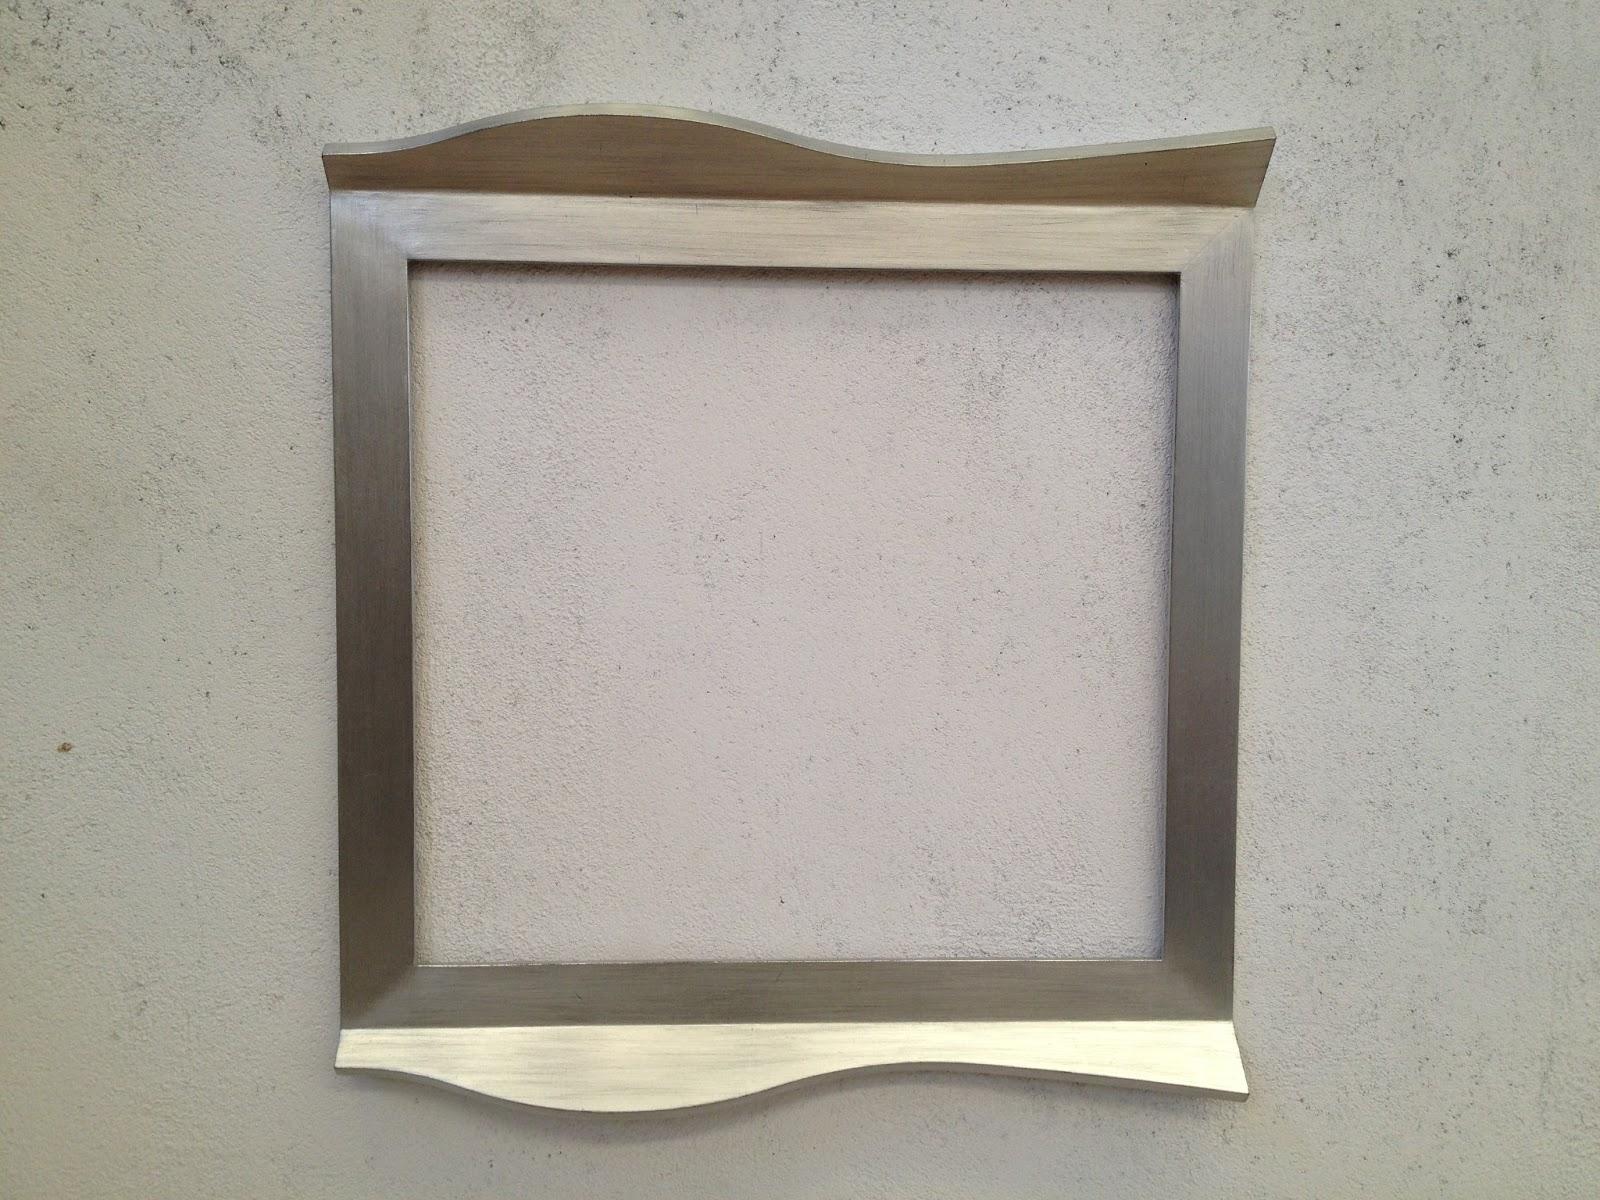 Kino marcos molduras marcos para cuadros enmarcacion for Cuadros a medida